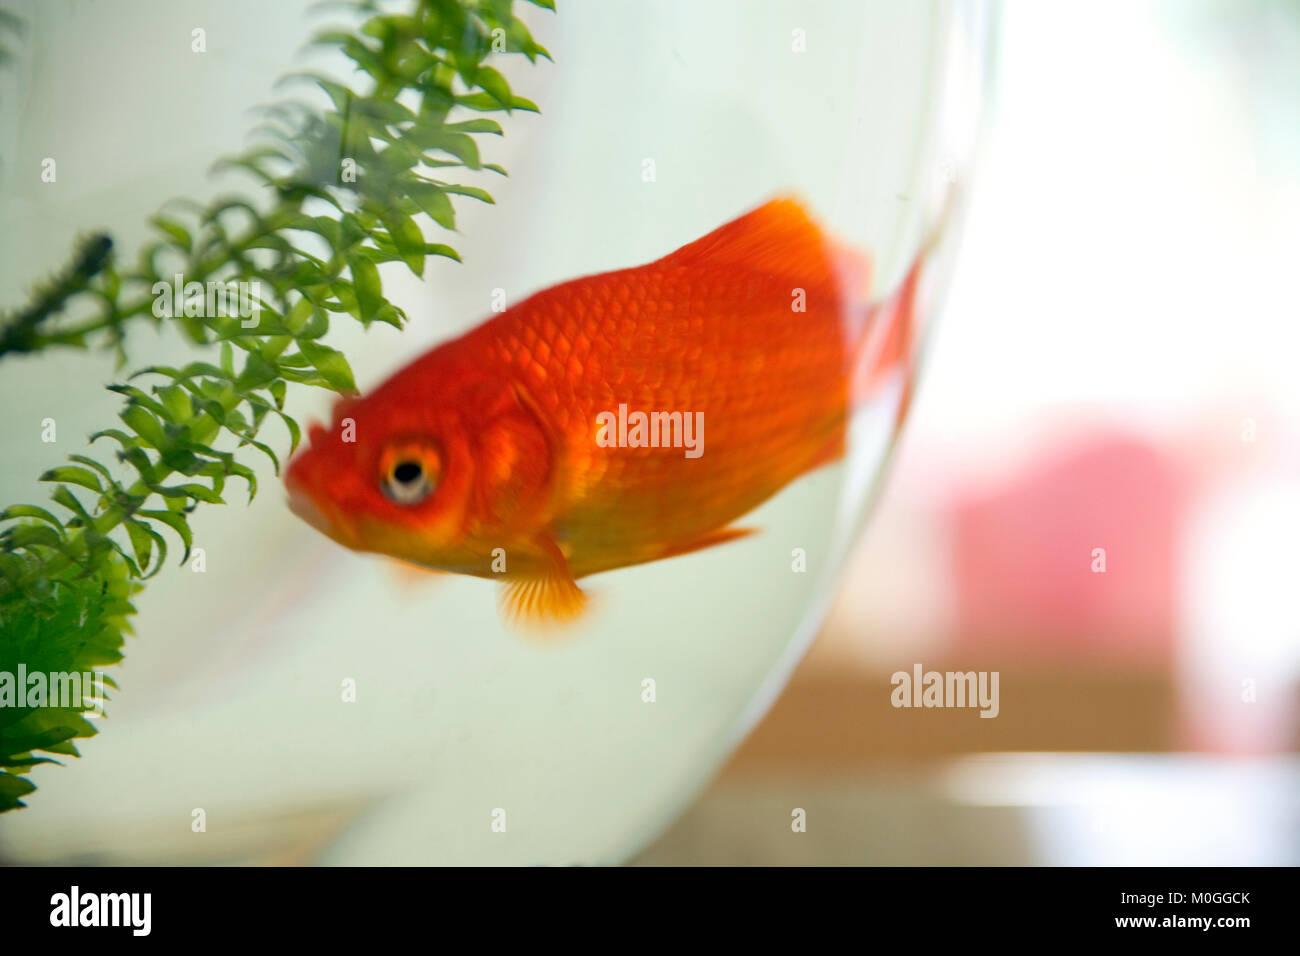 Goldfish Fish Colour Gold Orange Stock Photos & Goldfish Fish Colour ...